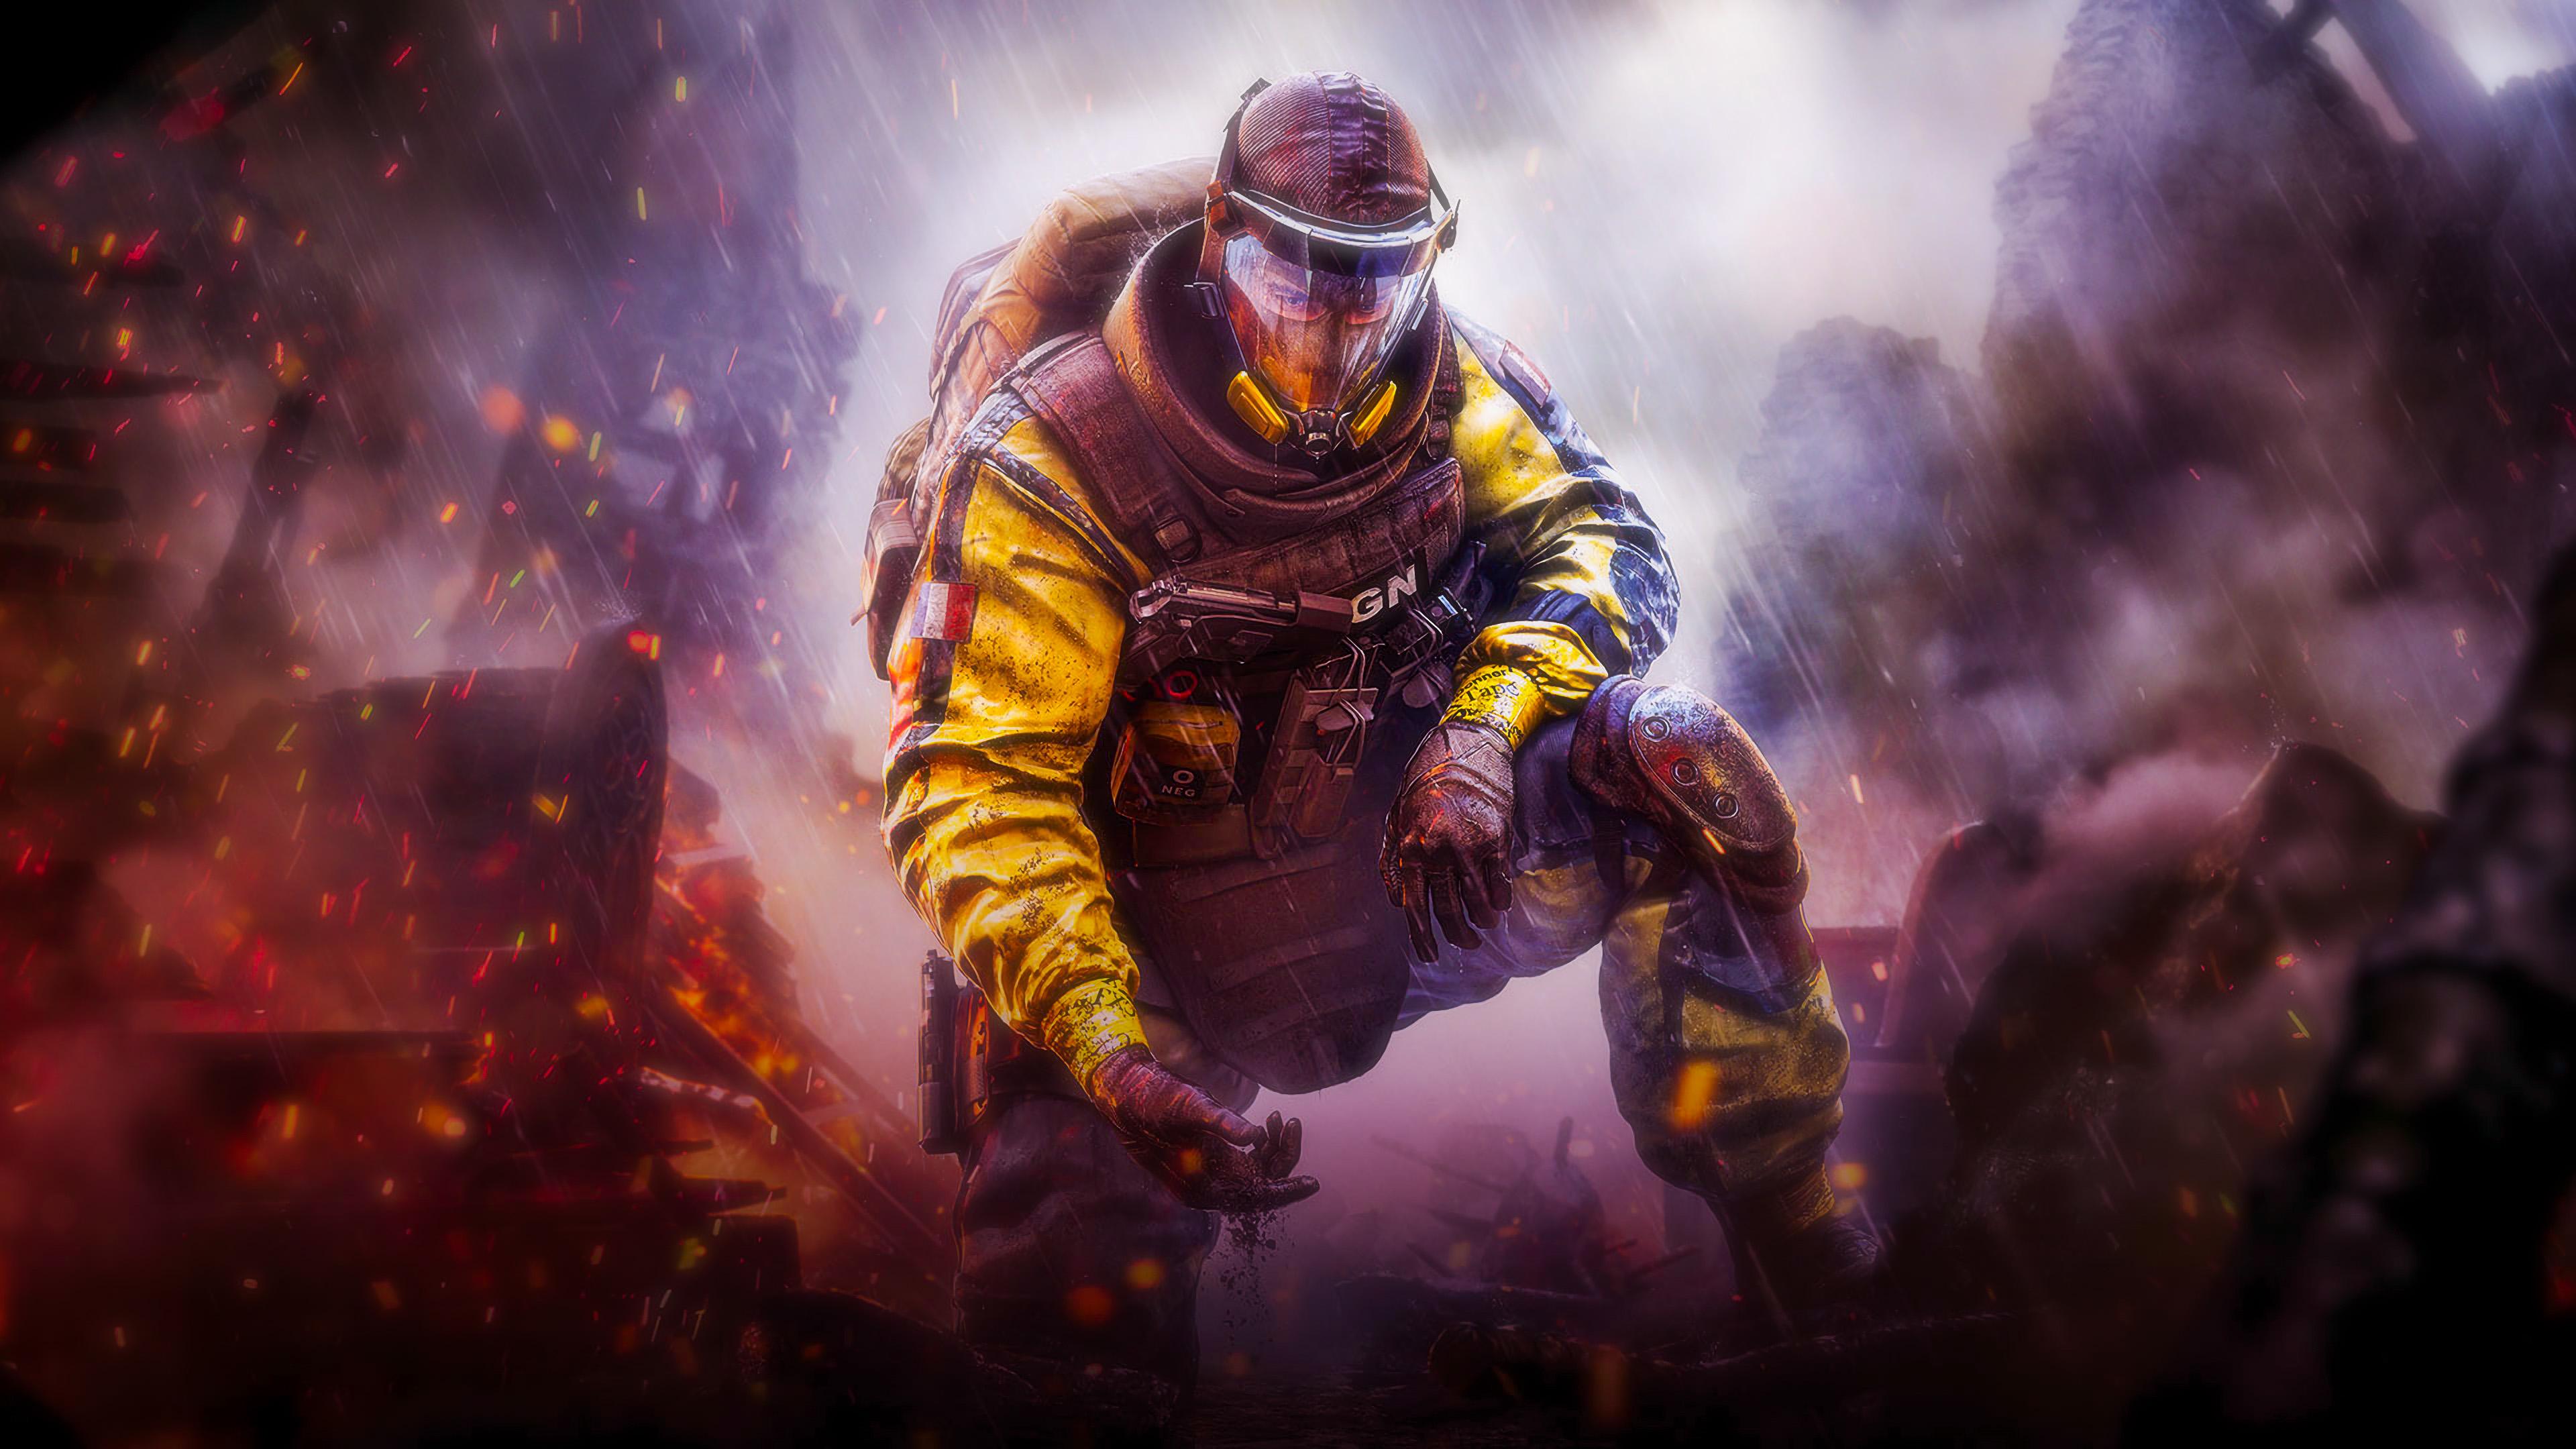 Gas Mask Tom Clancys Rainbow Six Siege Wallpaper Hd Games